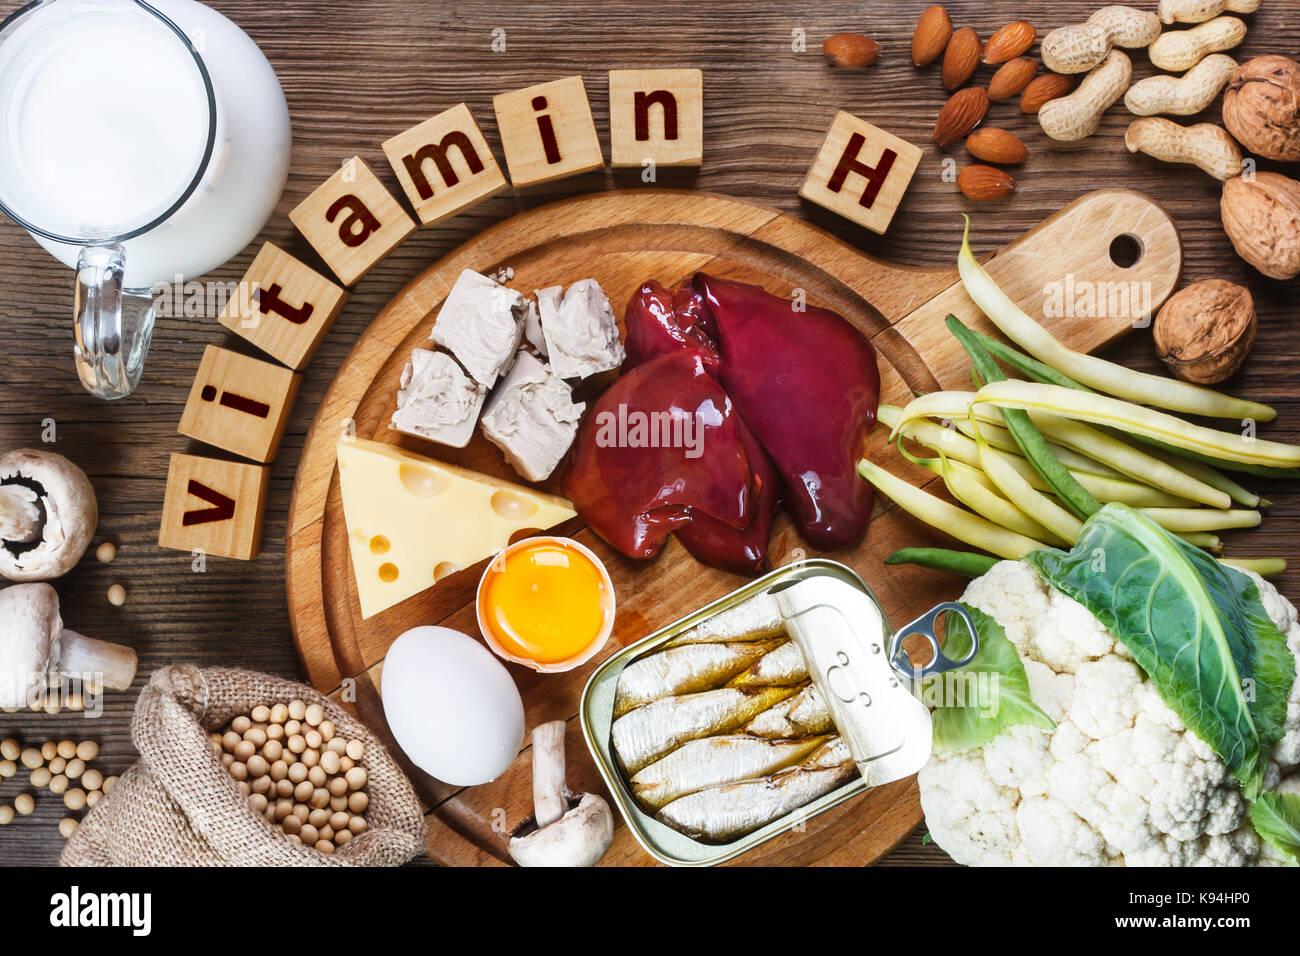 Foods rich in vitamin H (Biotin). Foods as liver, eggs yolk, yeast, cheese, sardines, soybeans, milk, cauliflower, - Stock Image